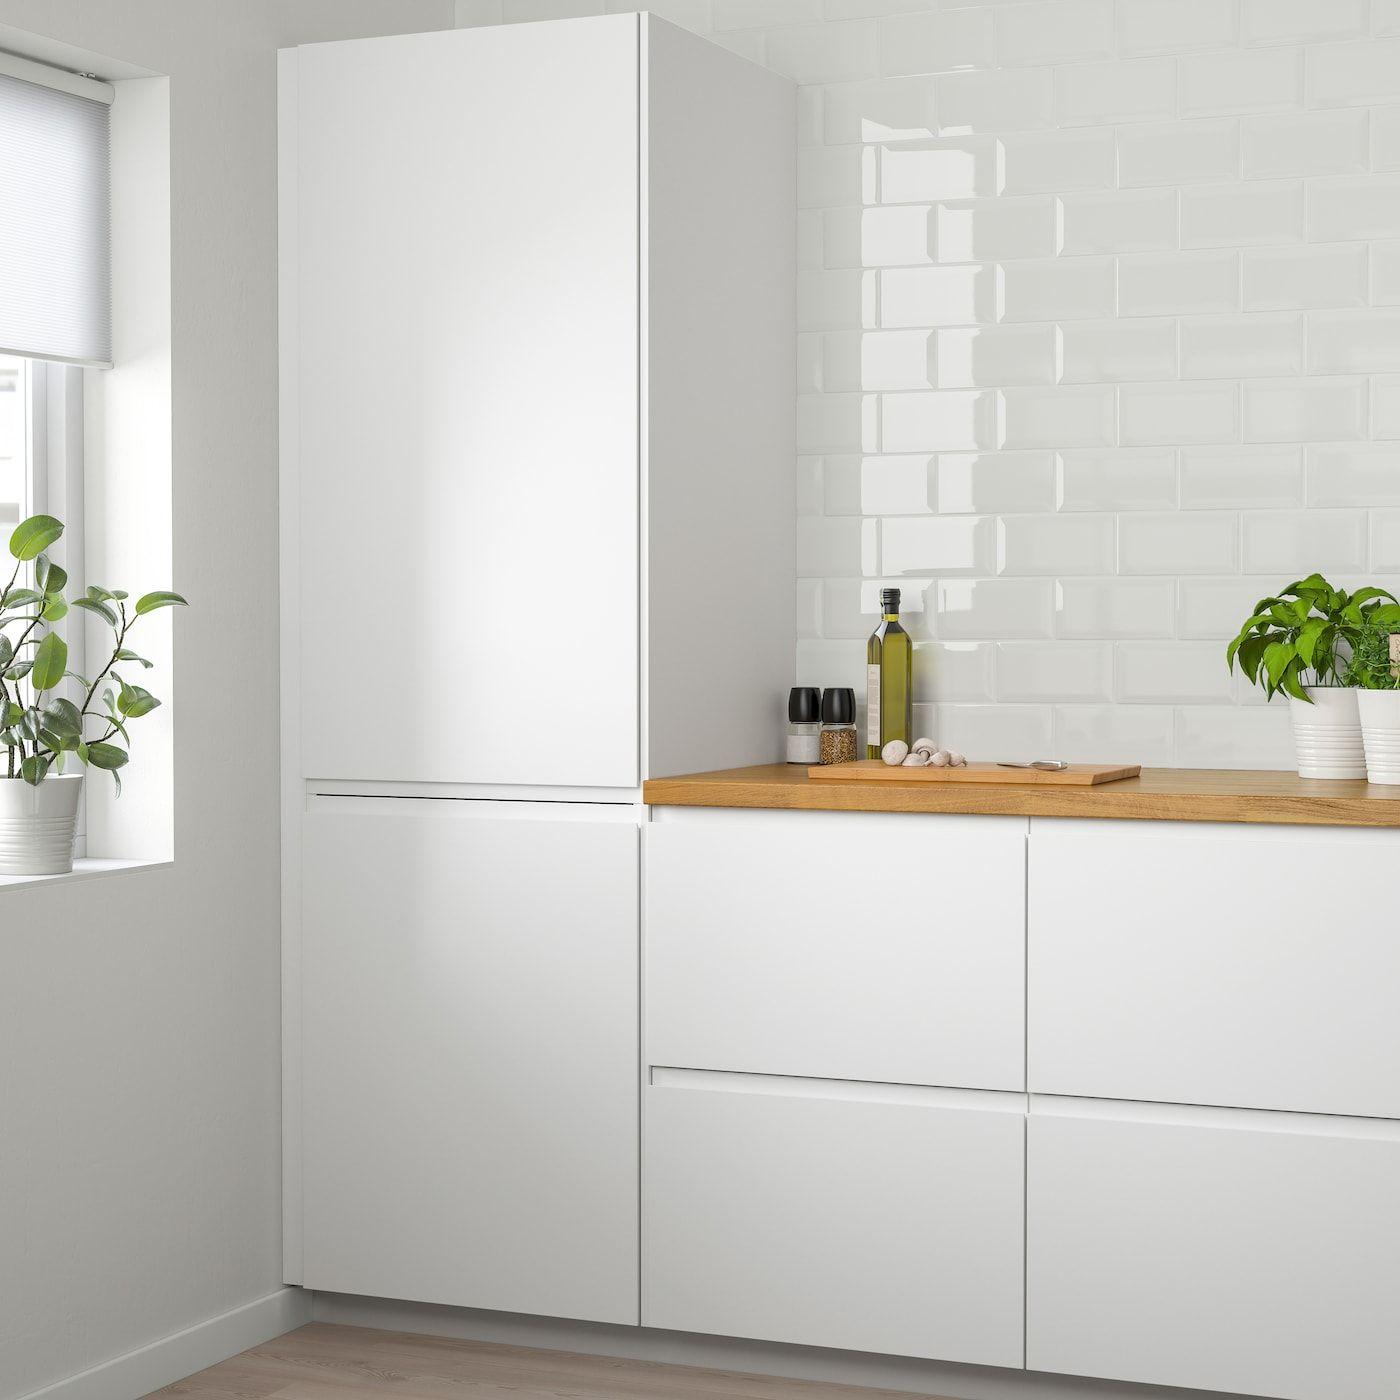 Seria Voxtorp Biala Kuchnia Ikea Kitchen Storage Kitchen Doors Ikea Kitchen